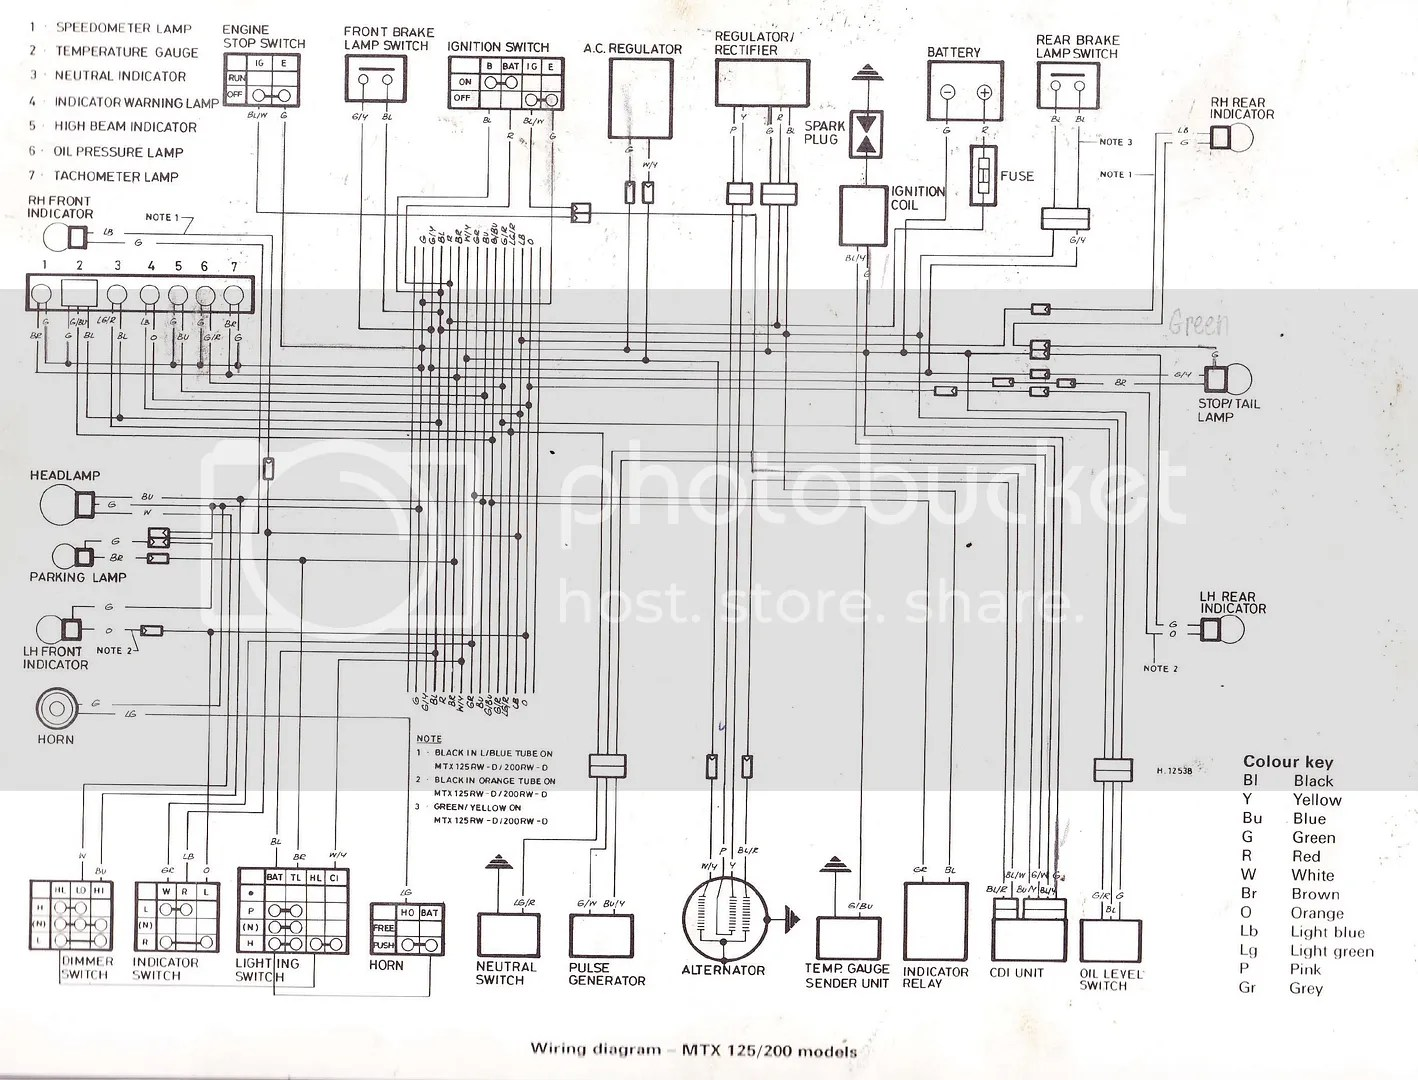 X11 Wiring Diagram - A day with Wiring diagram on sincgars radio configurations diagrams, engine diagrams, led circuit diagrams, switch diagrams, battery diagrams, electronic circuit diagrams, gmc fuse box diagrams, friendship bracelet diagrams, transformer diagrams, lighting diagrams, pinout diagrams, smart car diagrams, motor diagrams, series and parallel circuits diagrams, electrical diagrams, hvac diagrams, troubleshooting diagrams, honda motorcycle repair diagrams, internet of things diagrams,